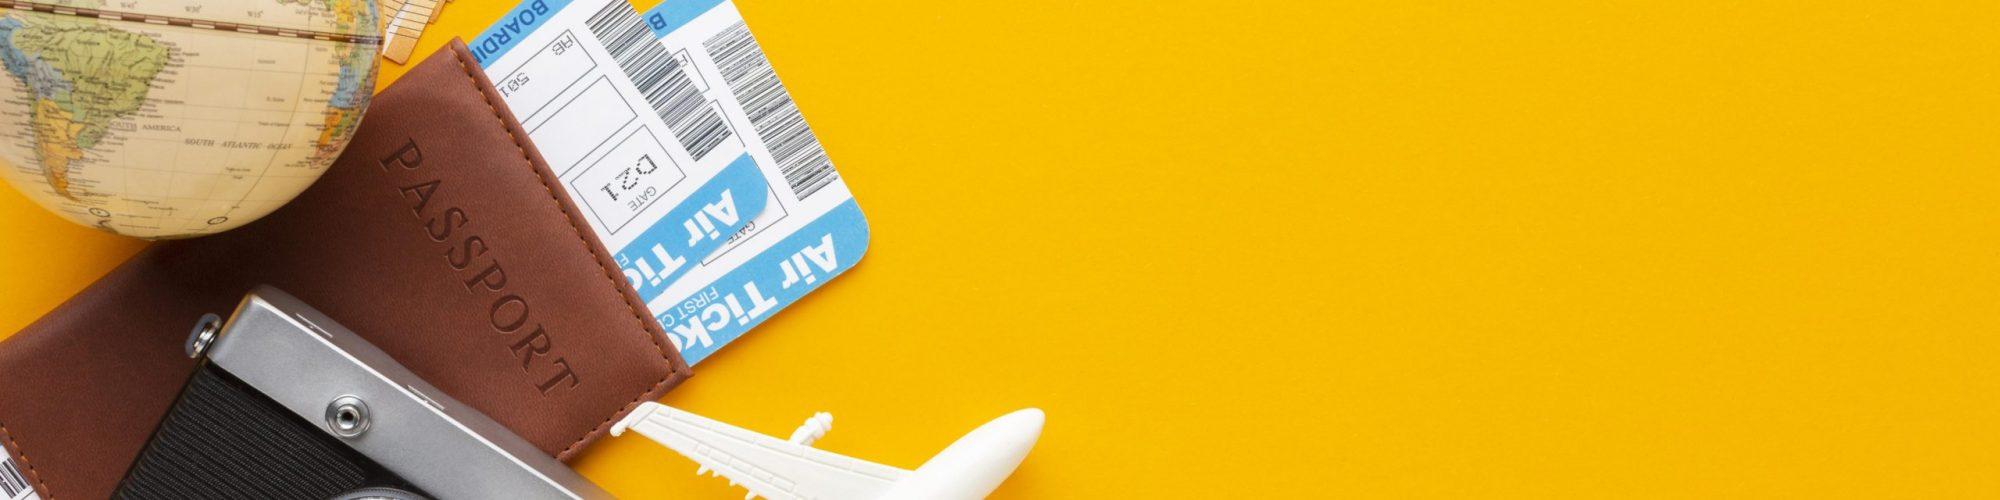 flat-lay-tickets-camera-arrangement